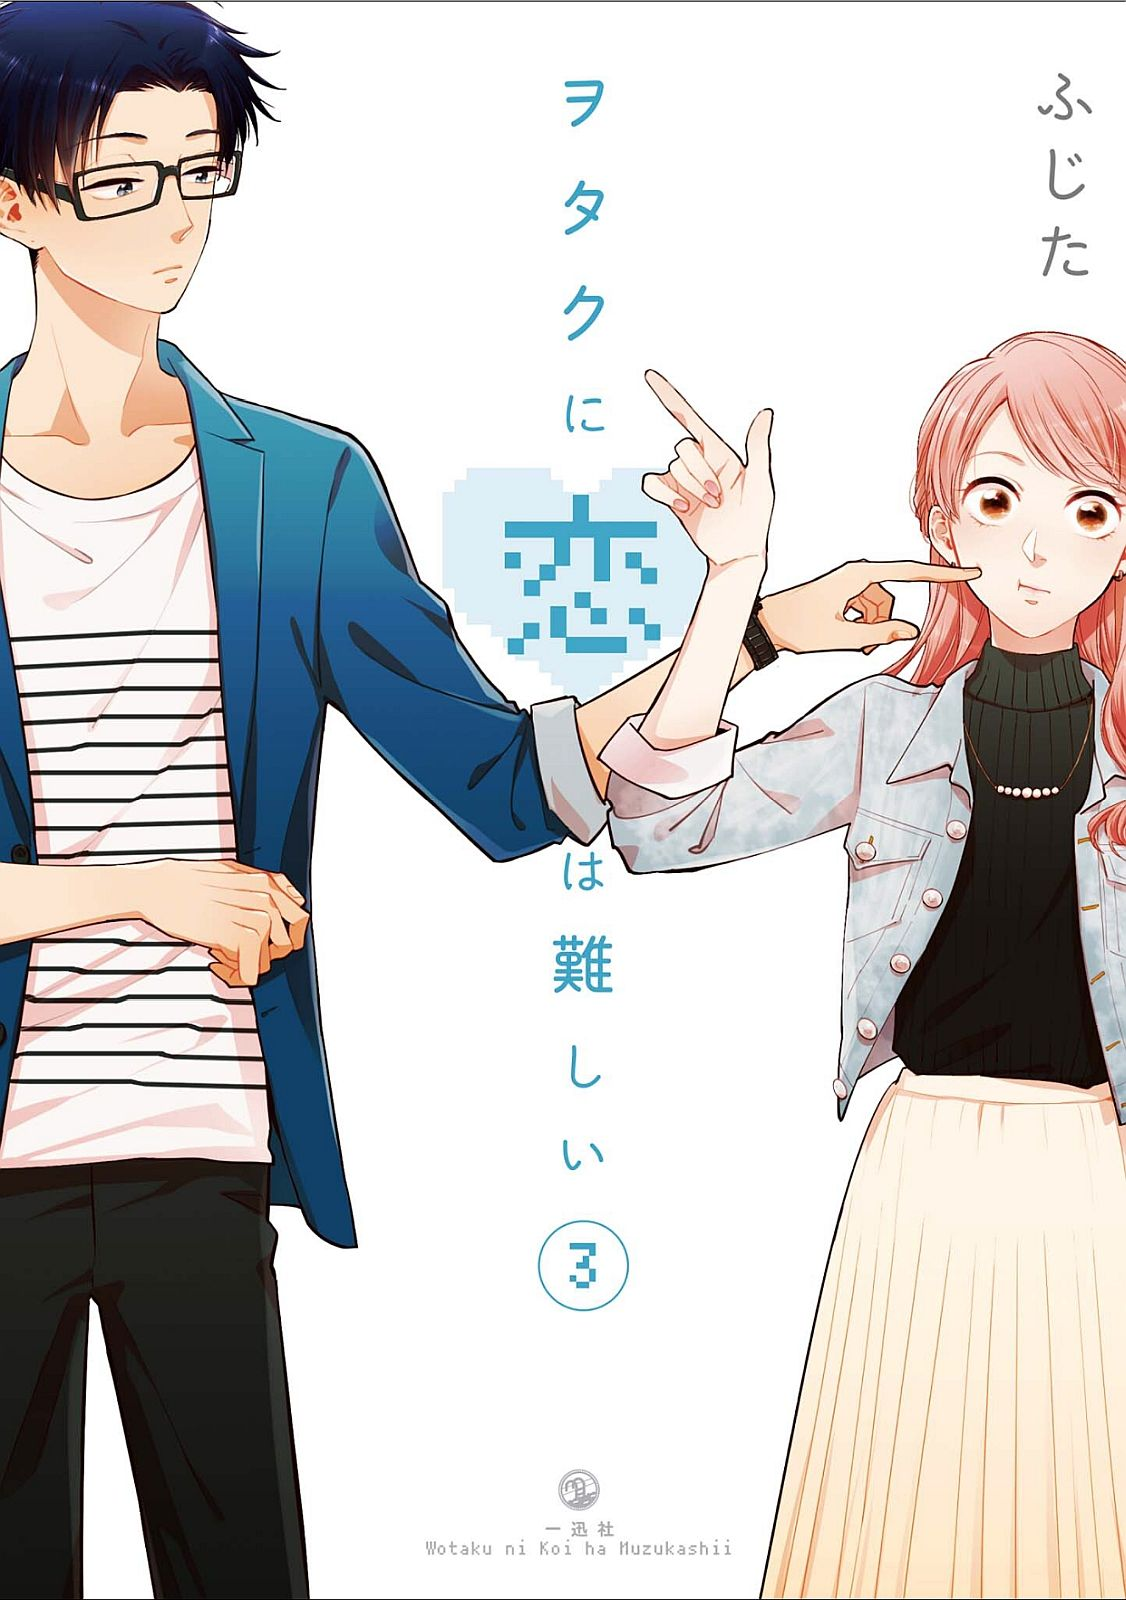 Wotaku ni koi wa Muzukashii Manga covers, Anime, Anime